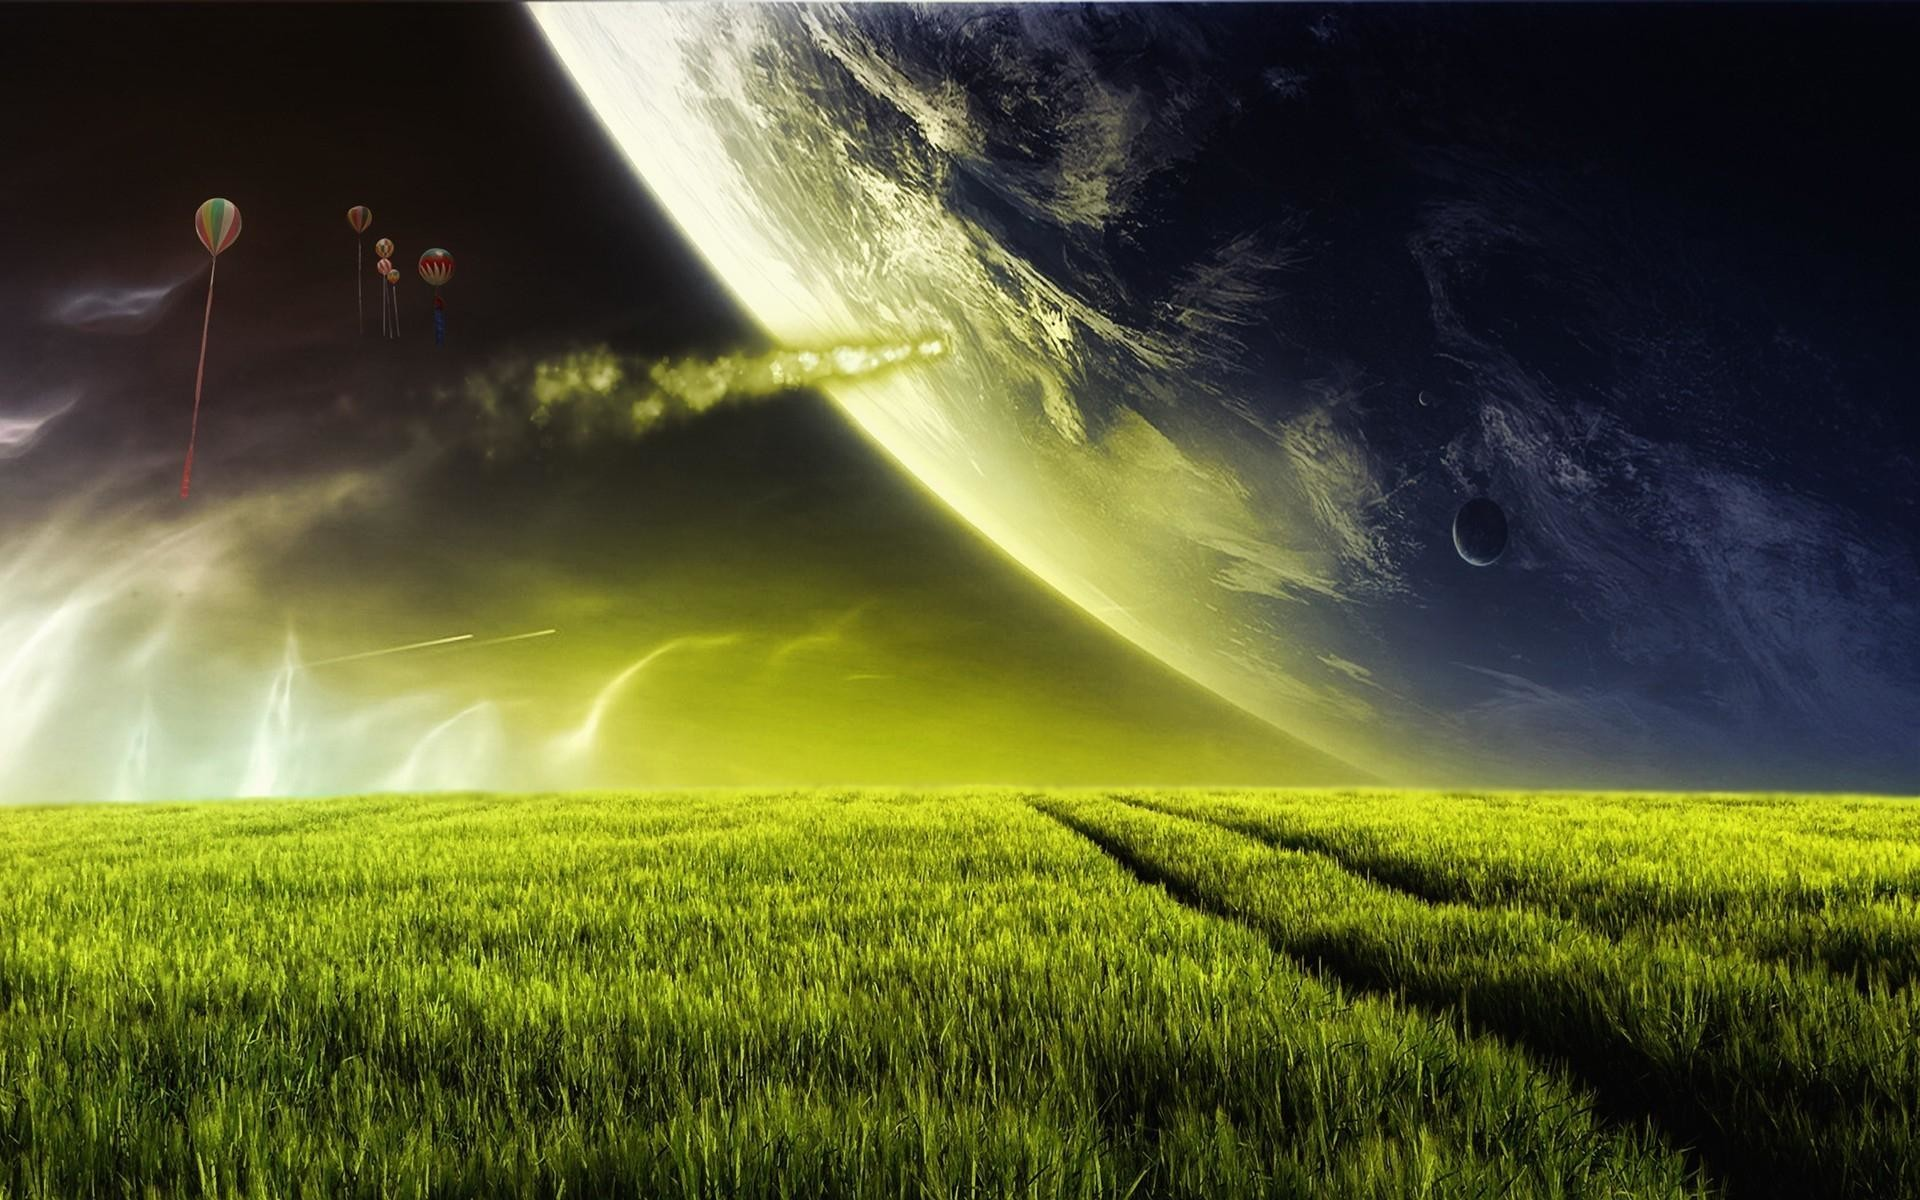 wallpaper.wiki-Download-Free-Alien-Planet-Background-PIC-